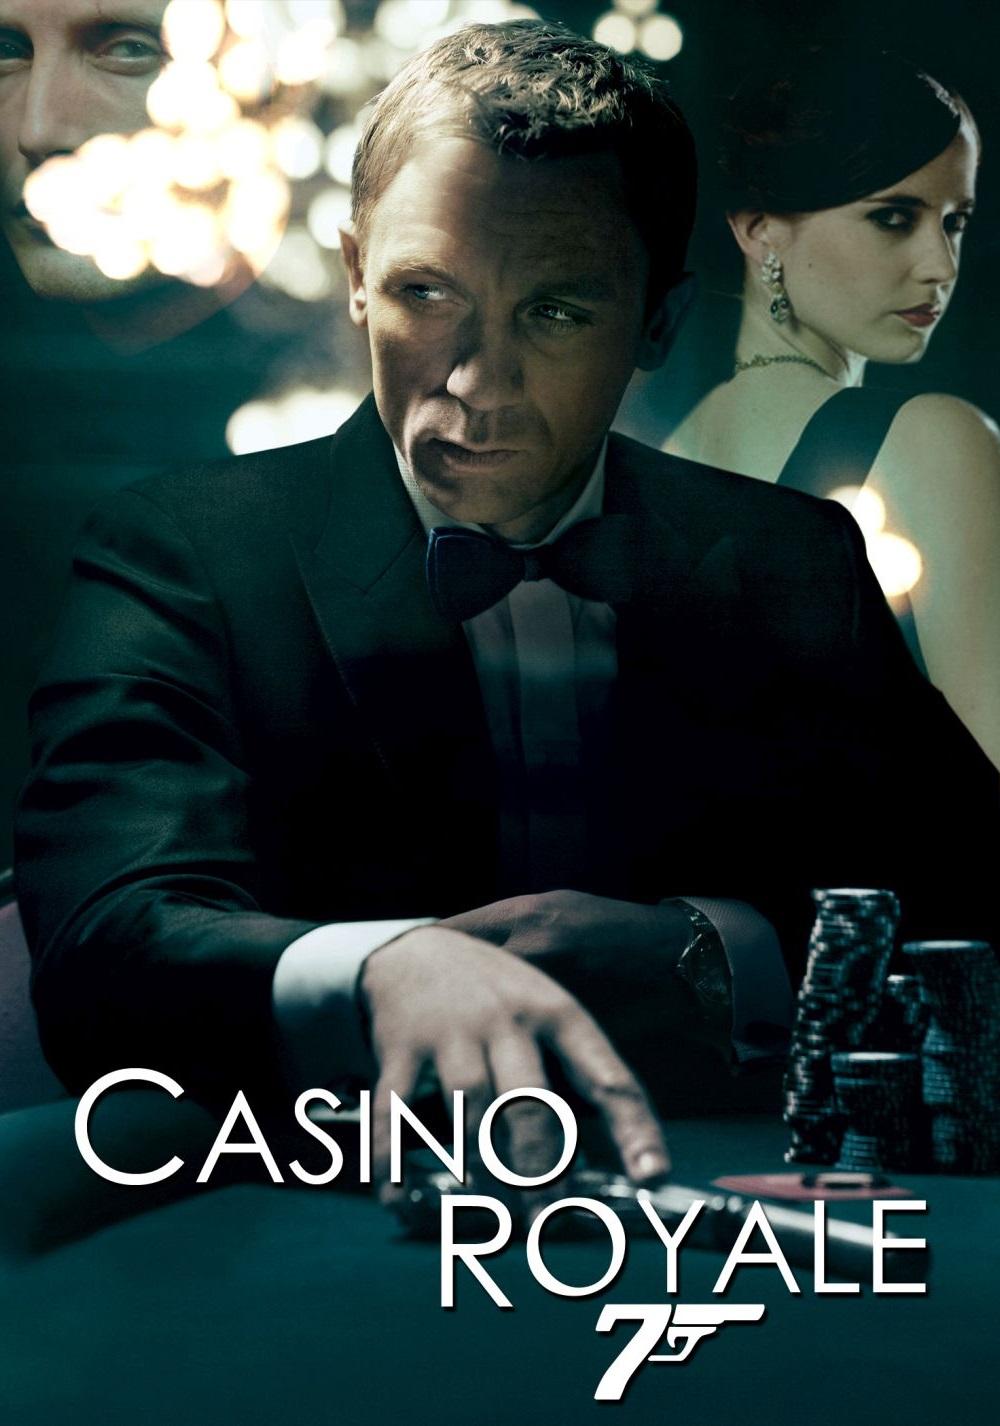 James bond zitate casino royal